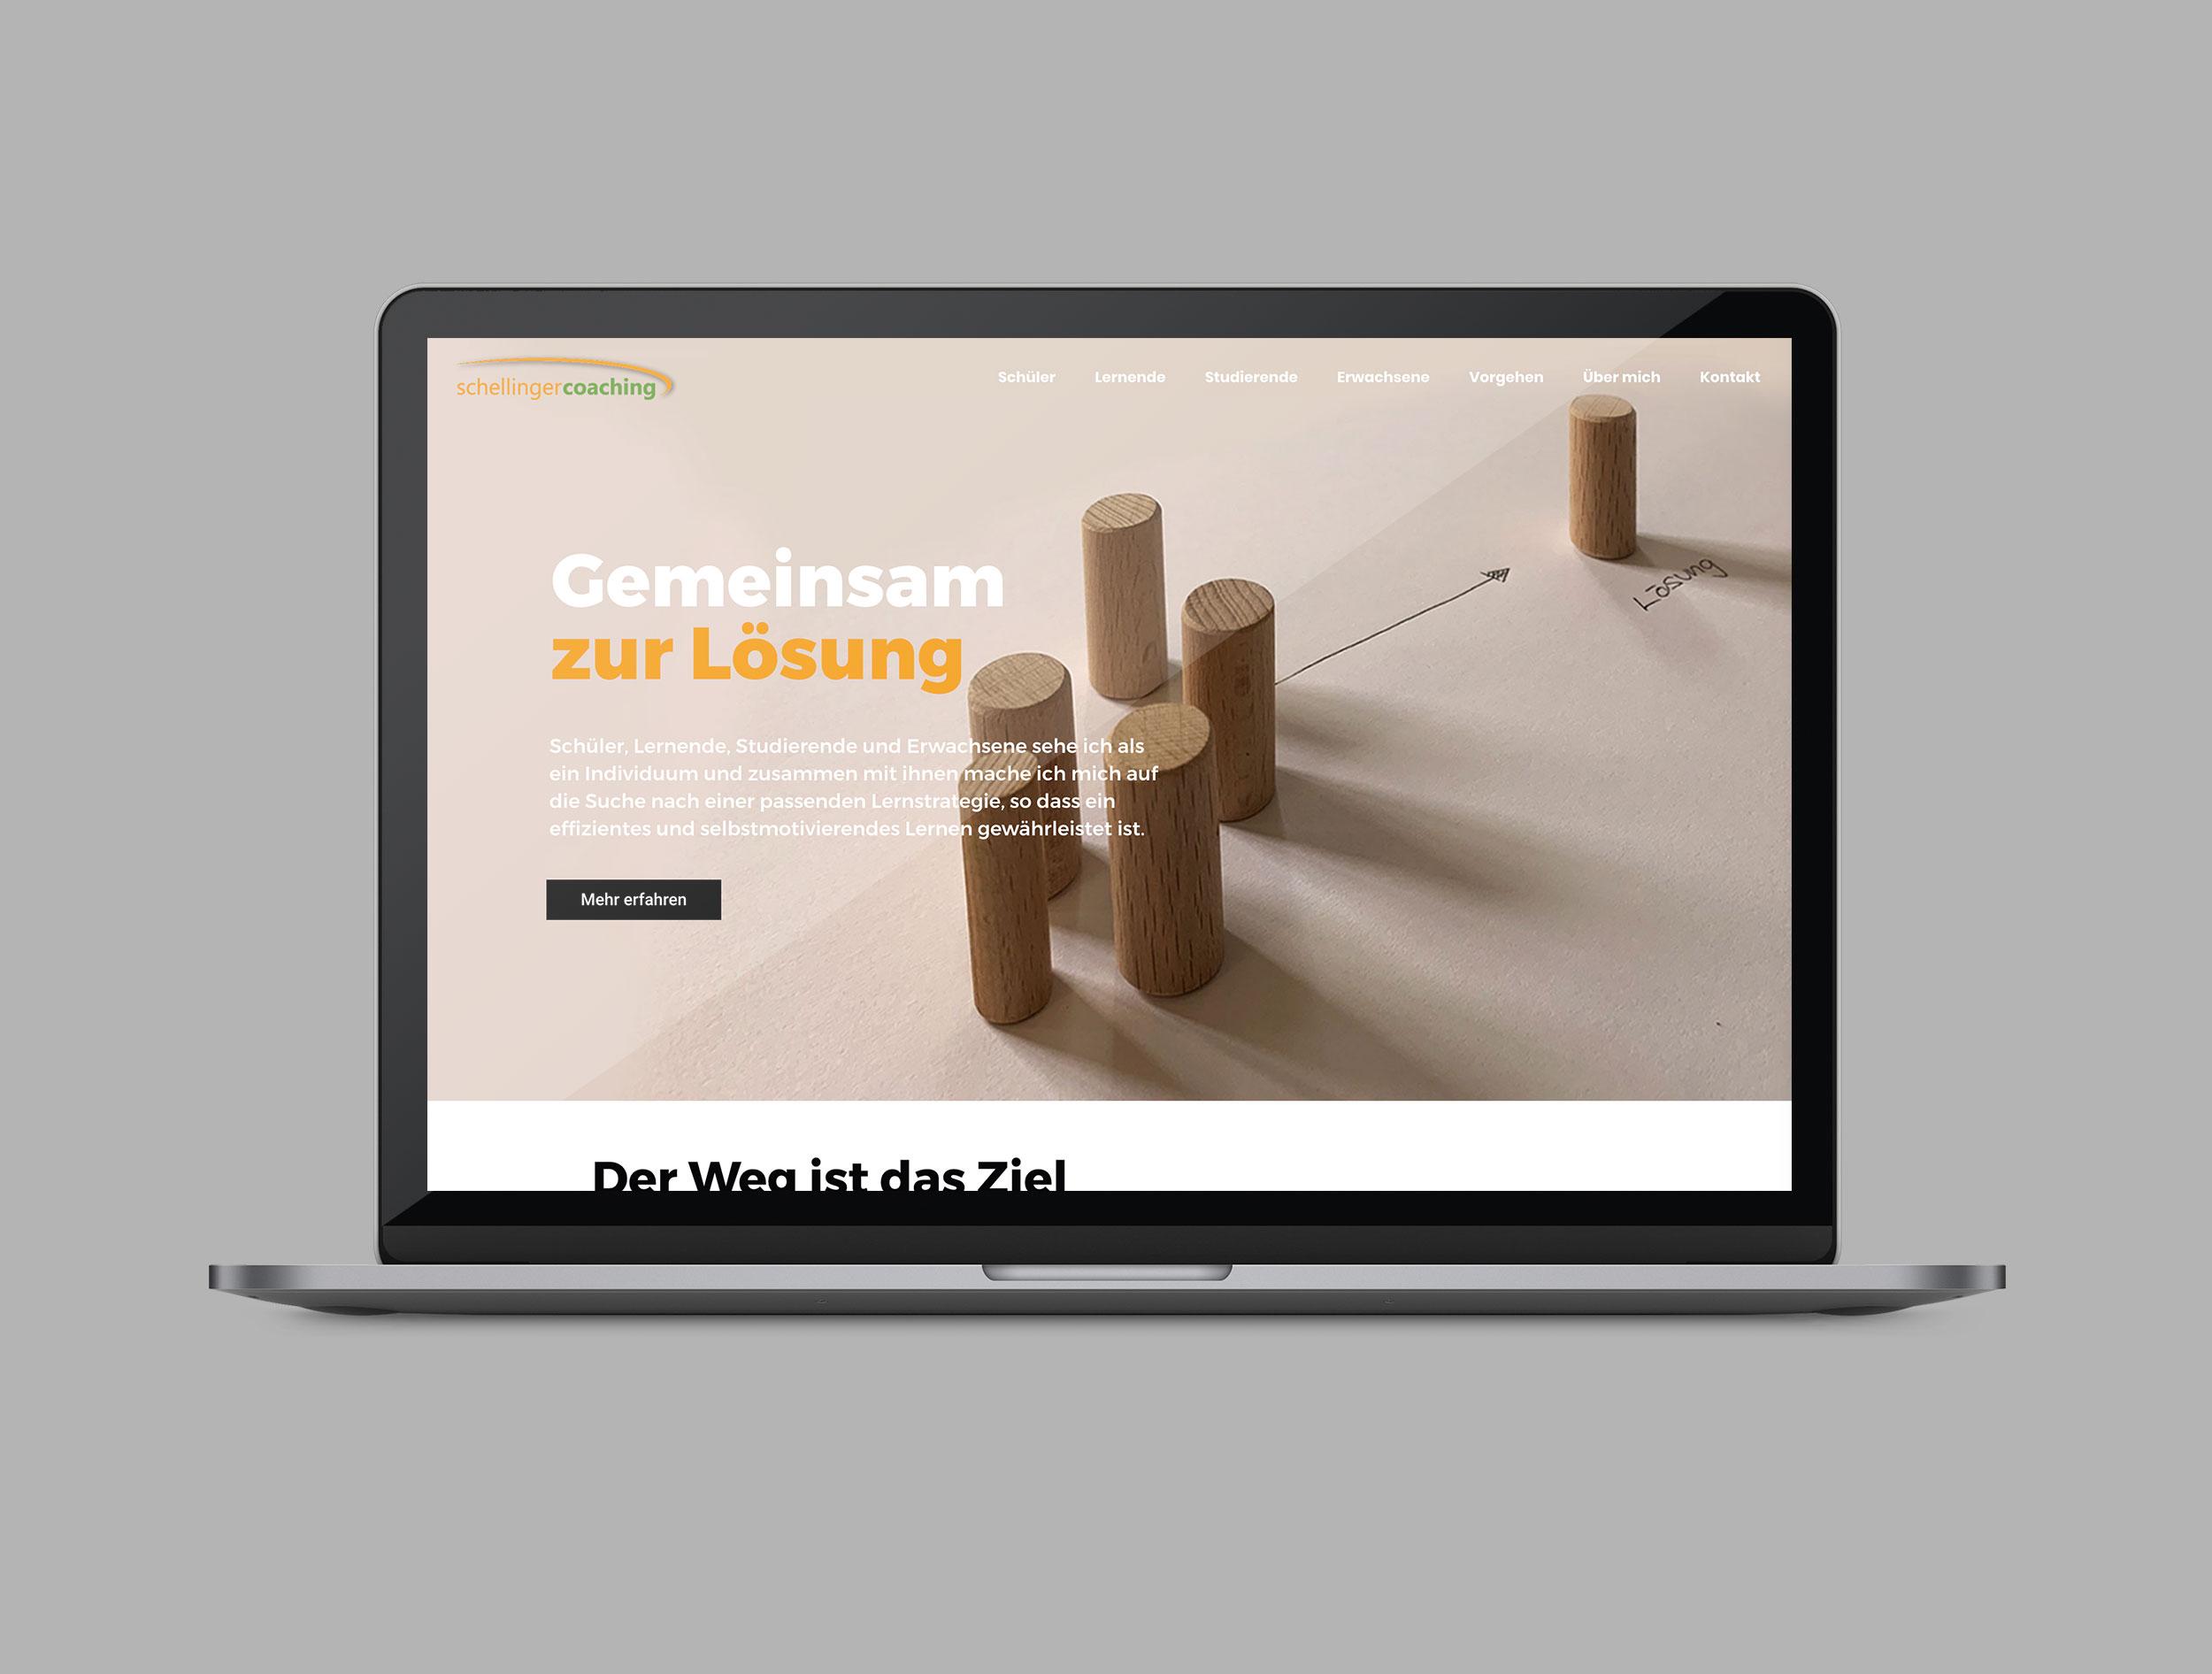 Webdesignagentur – Gasser Miesch St Gallen